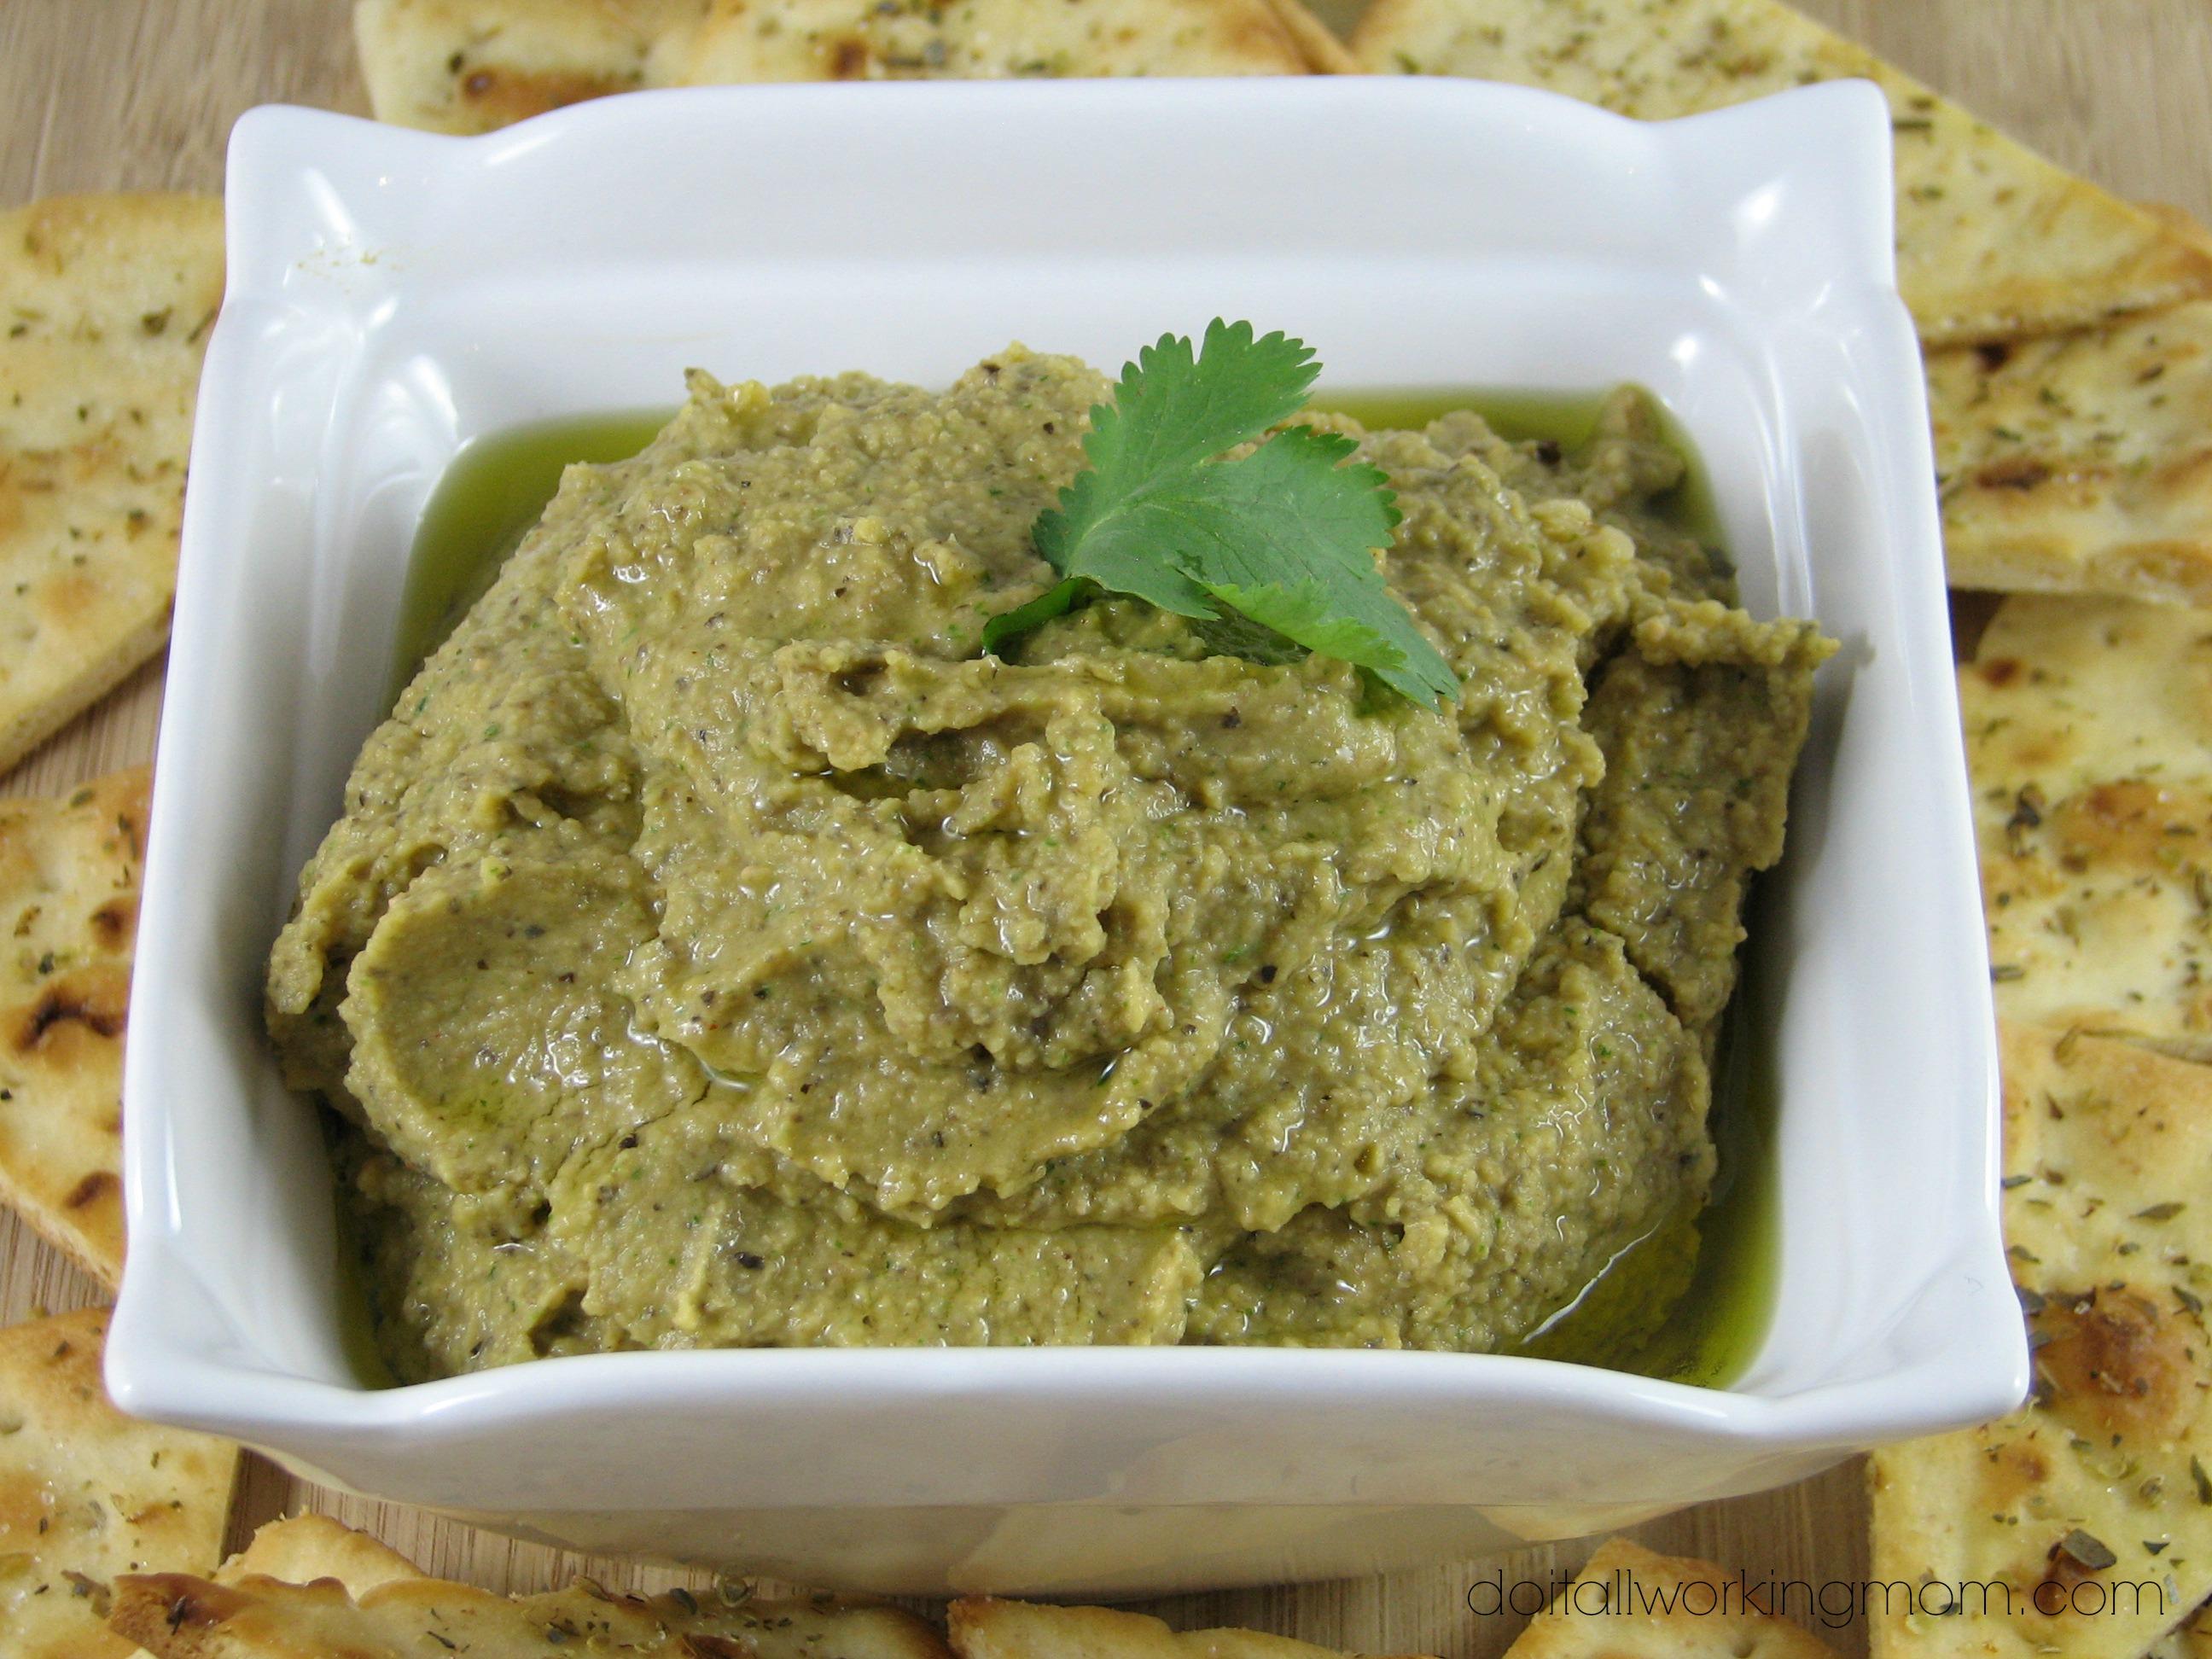 Easy Hummus Recipe (without tahini)